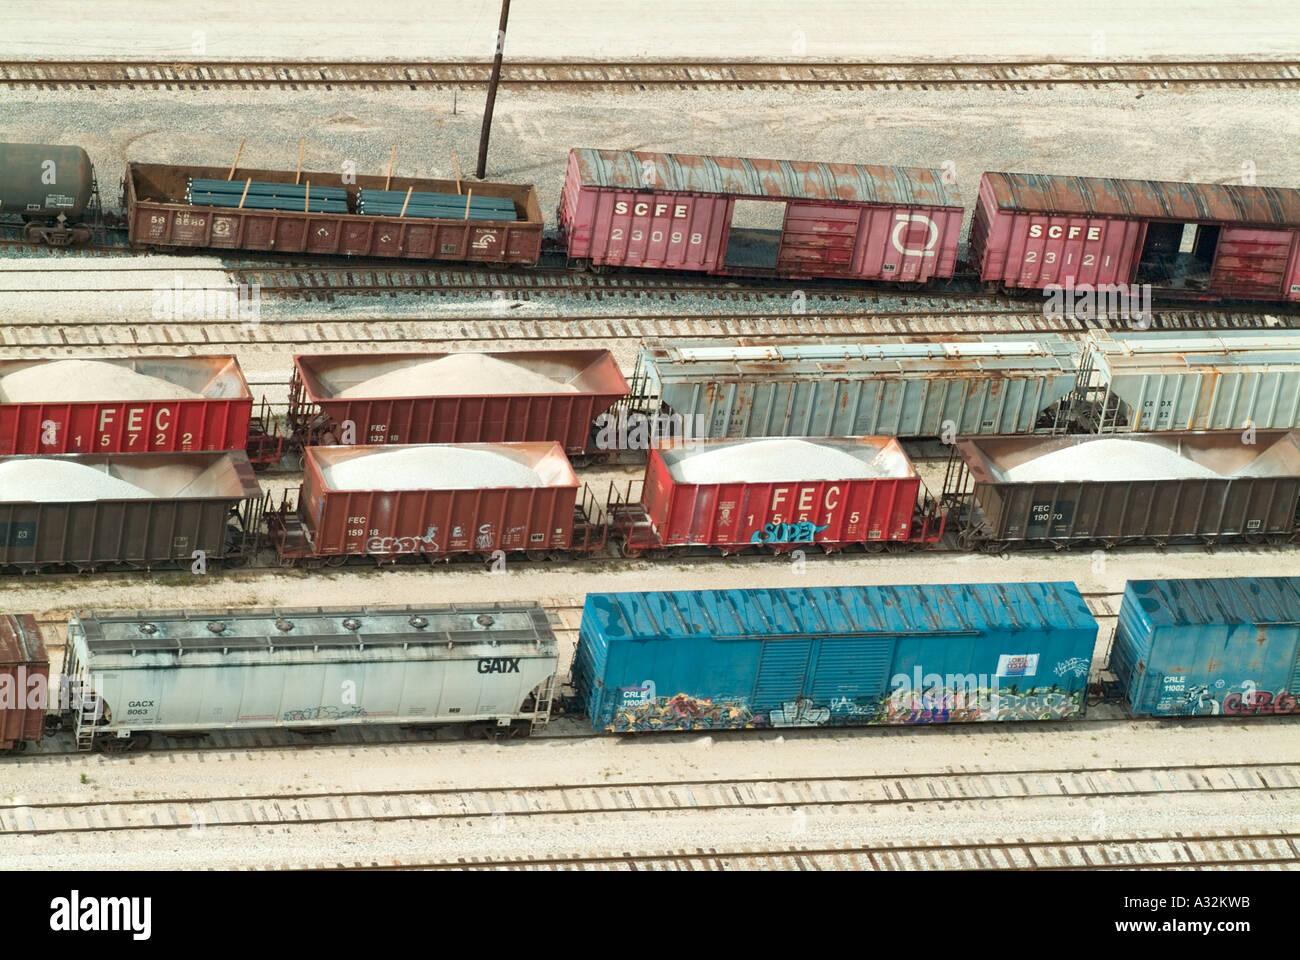 trains railroad railroading tracks transportation box cars boxcars